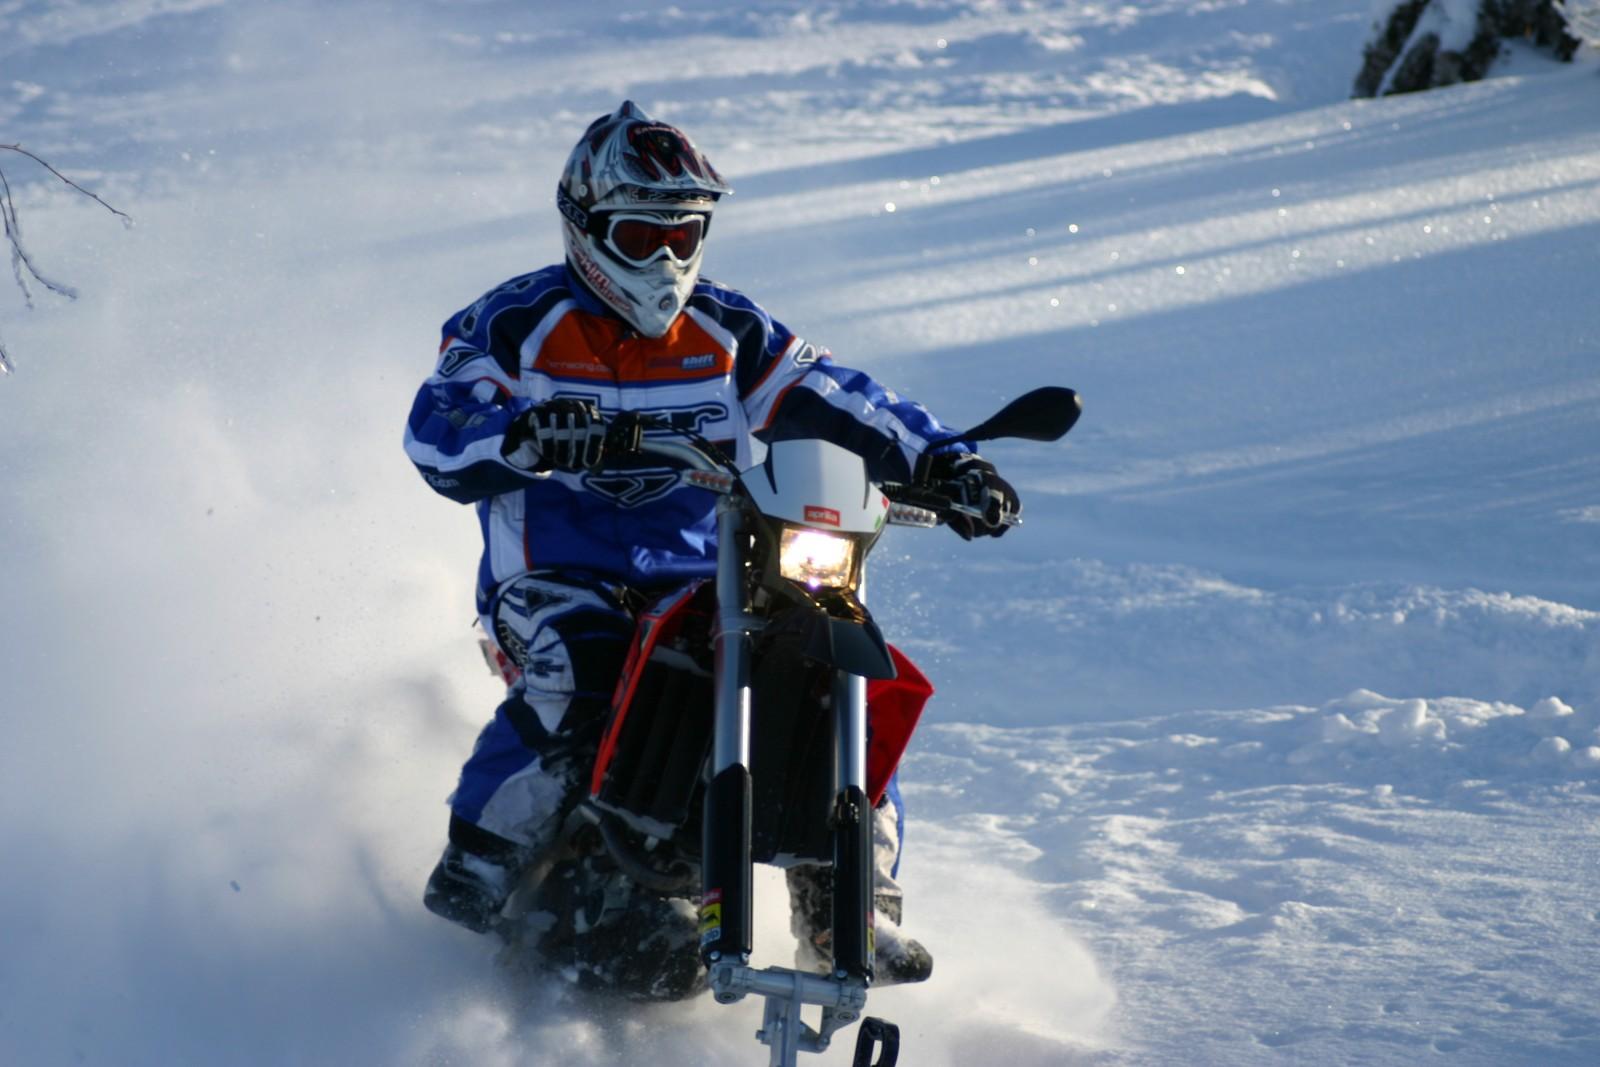 Explorer-snowbike-track-system-for-dirt-bike-supermoto-enduro-mx-AD-Boivin-119-1600x1067